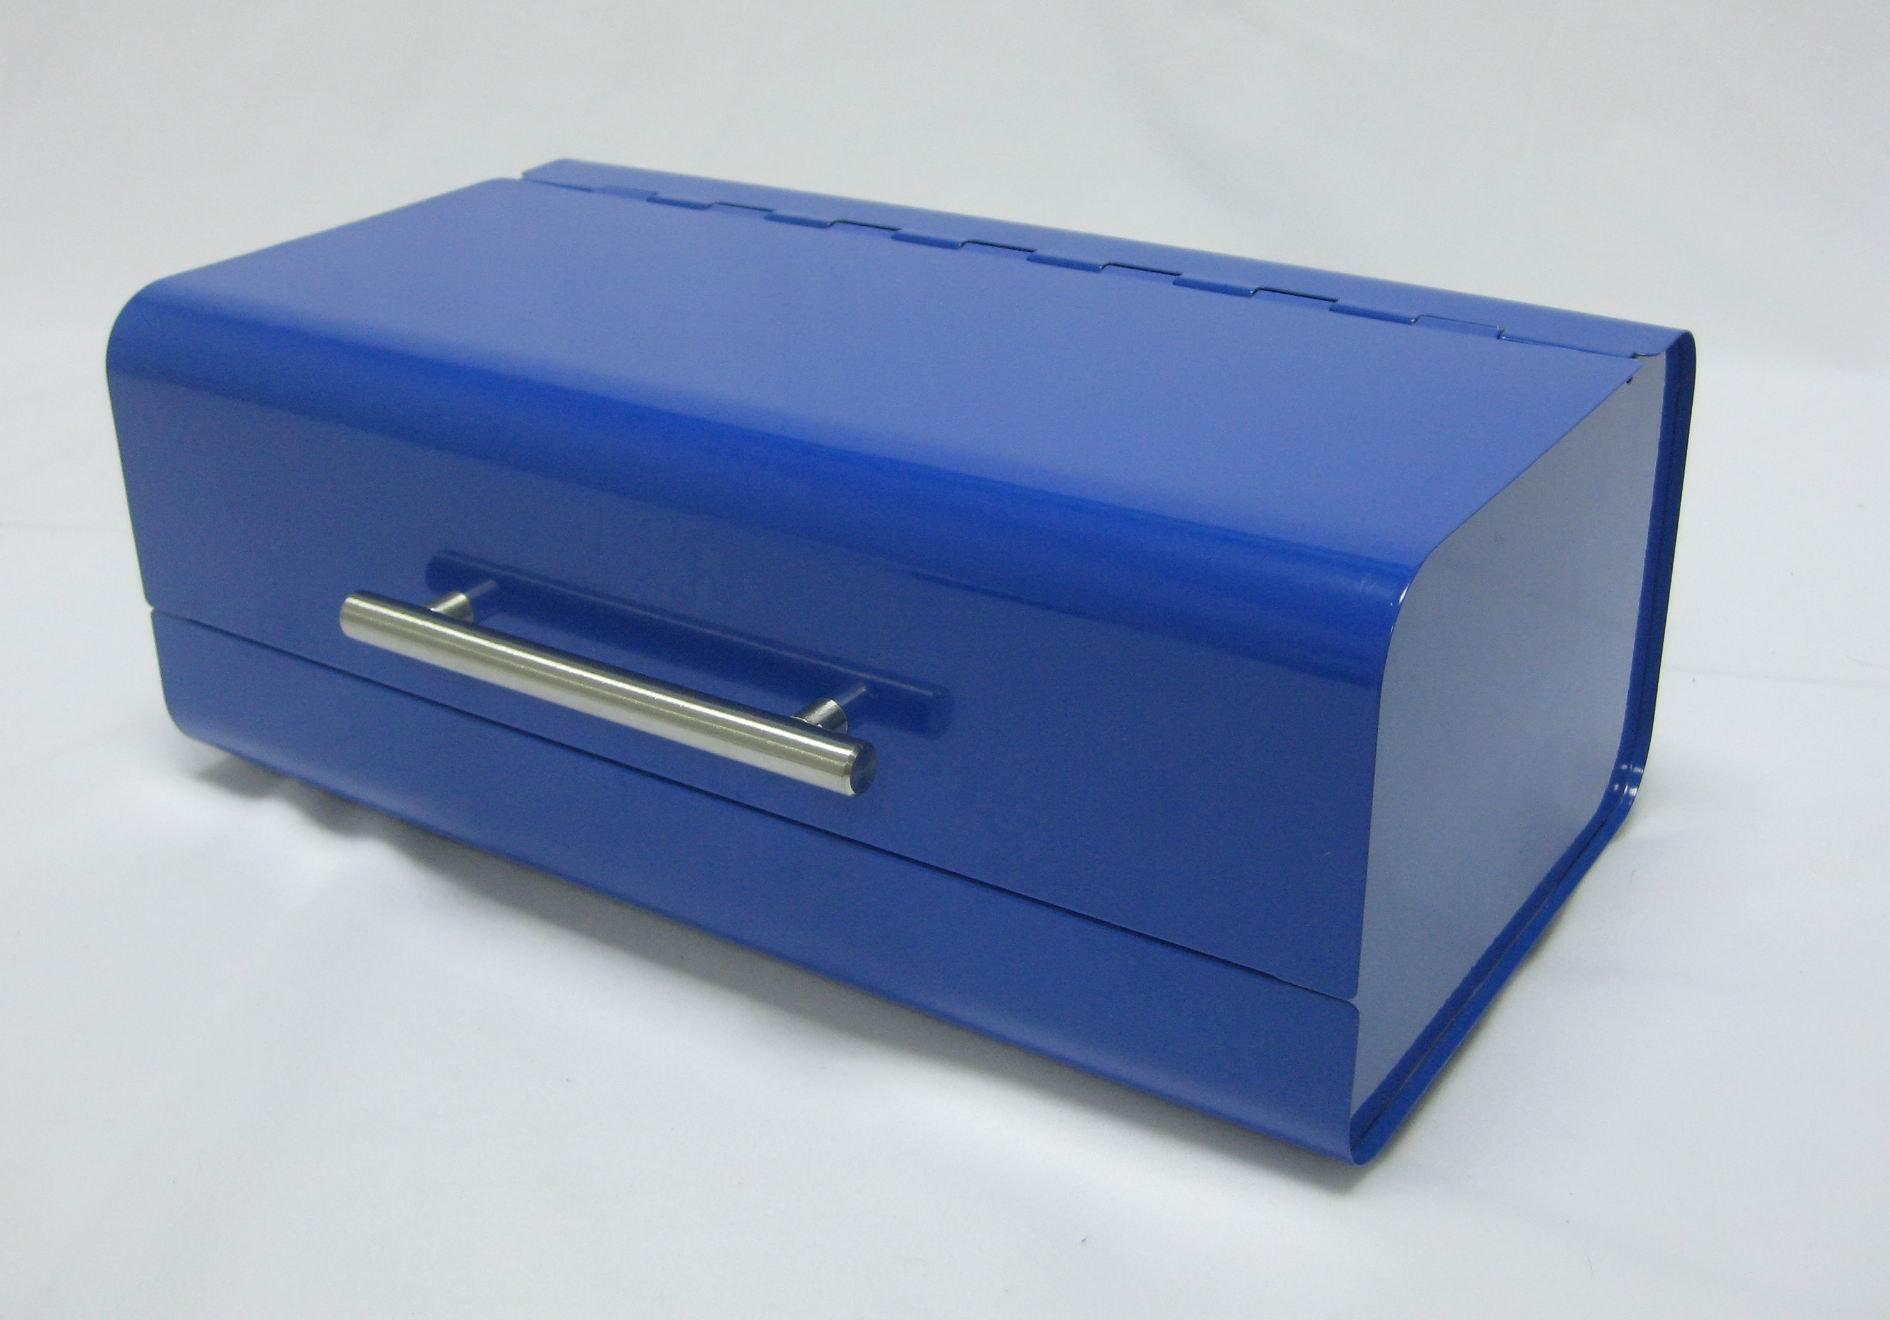 modern lfgb rectangular bread box storage metal handle  buy  - modern lfgb rectangular bread box storage metal handle